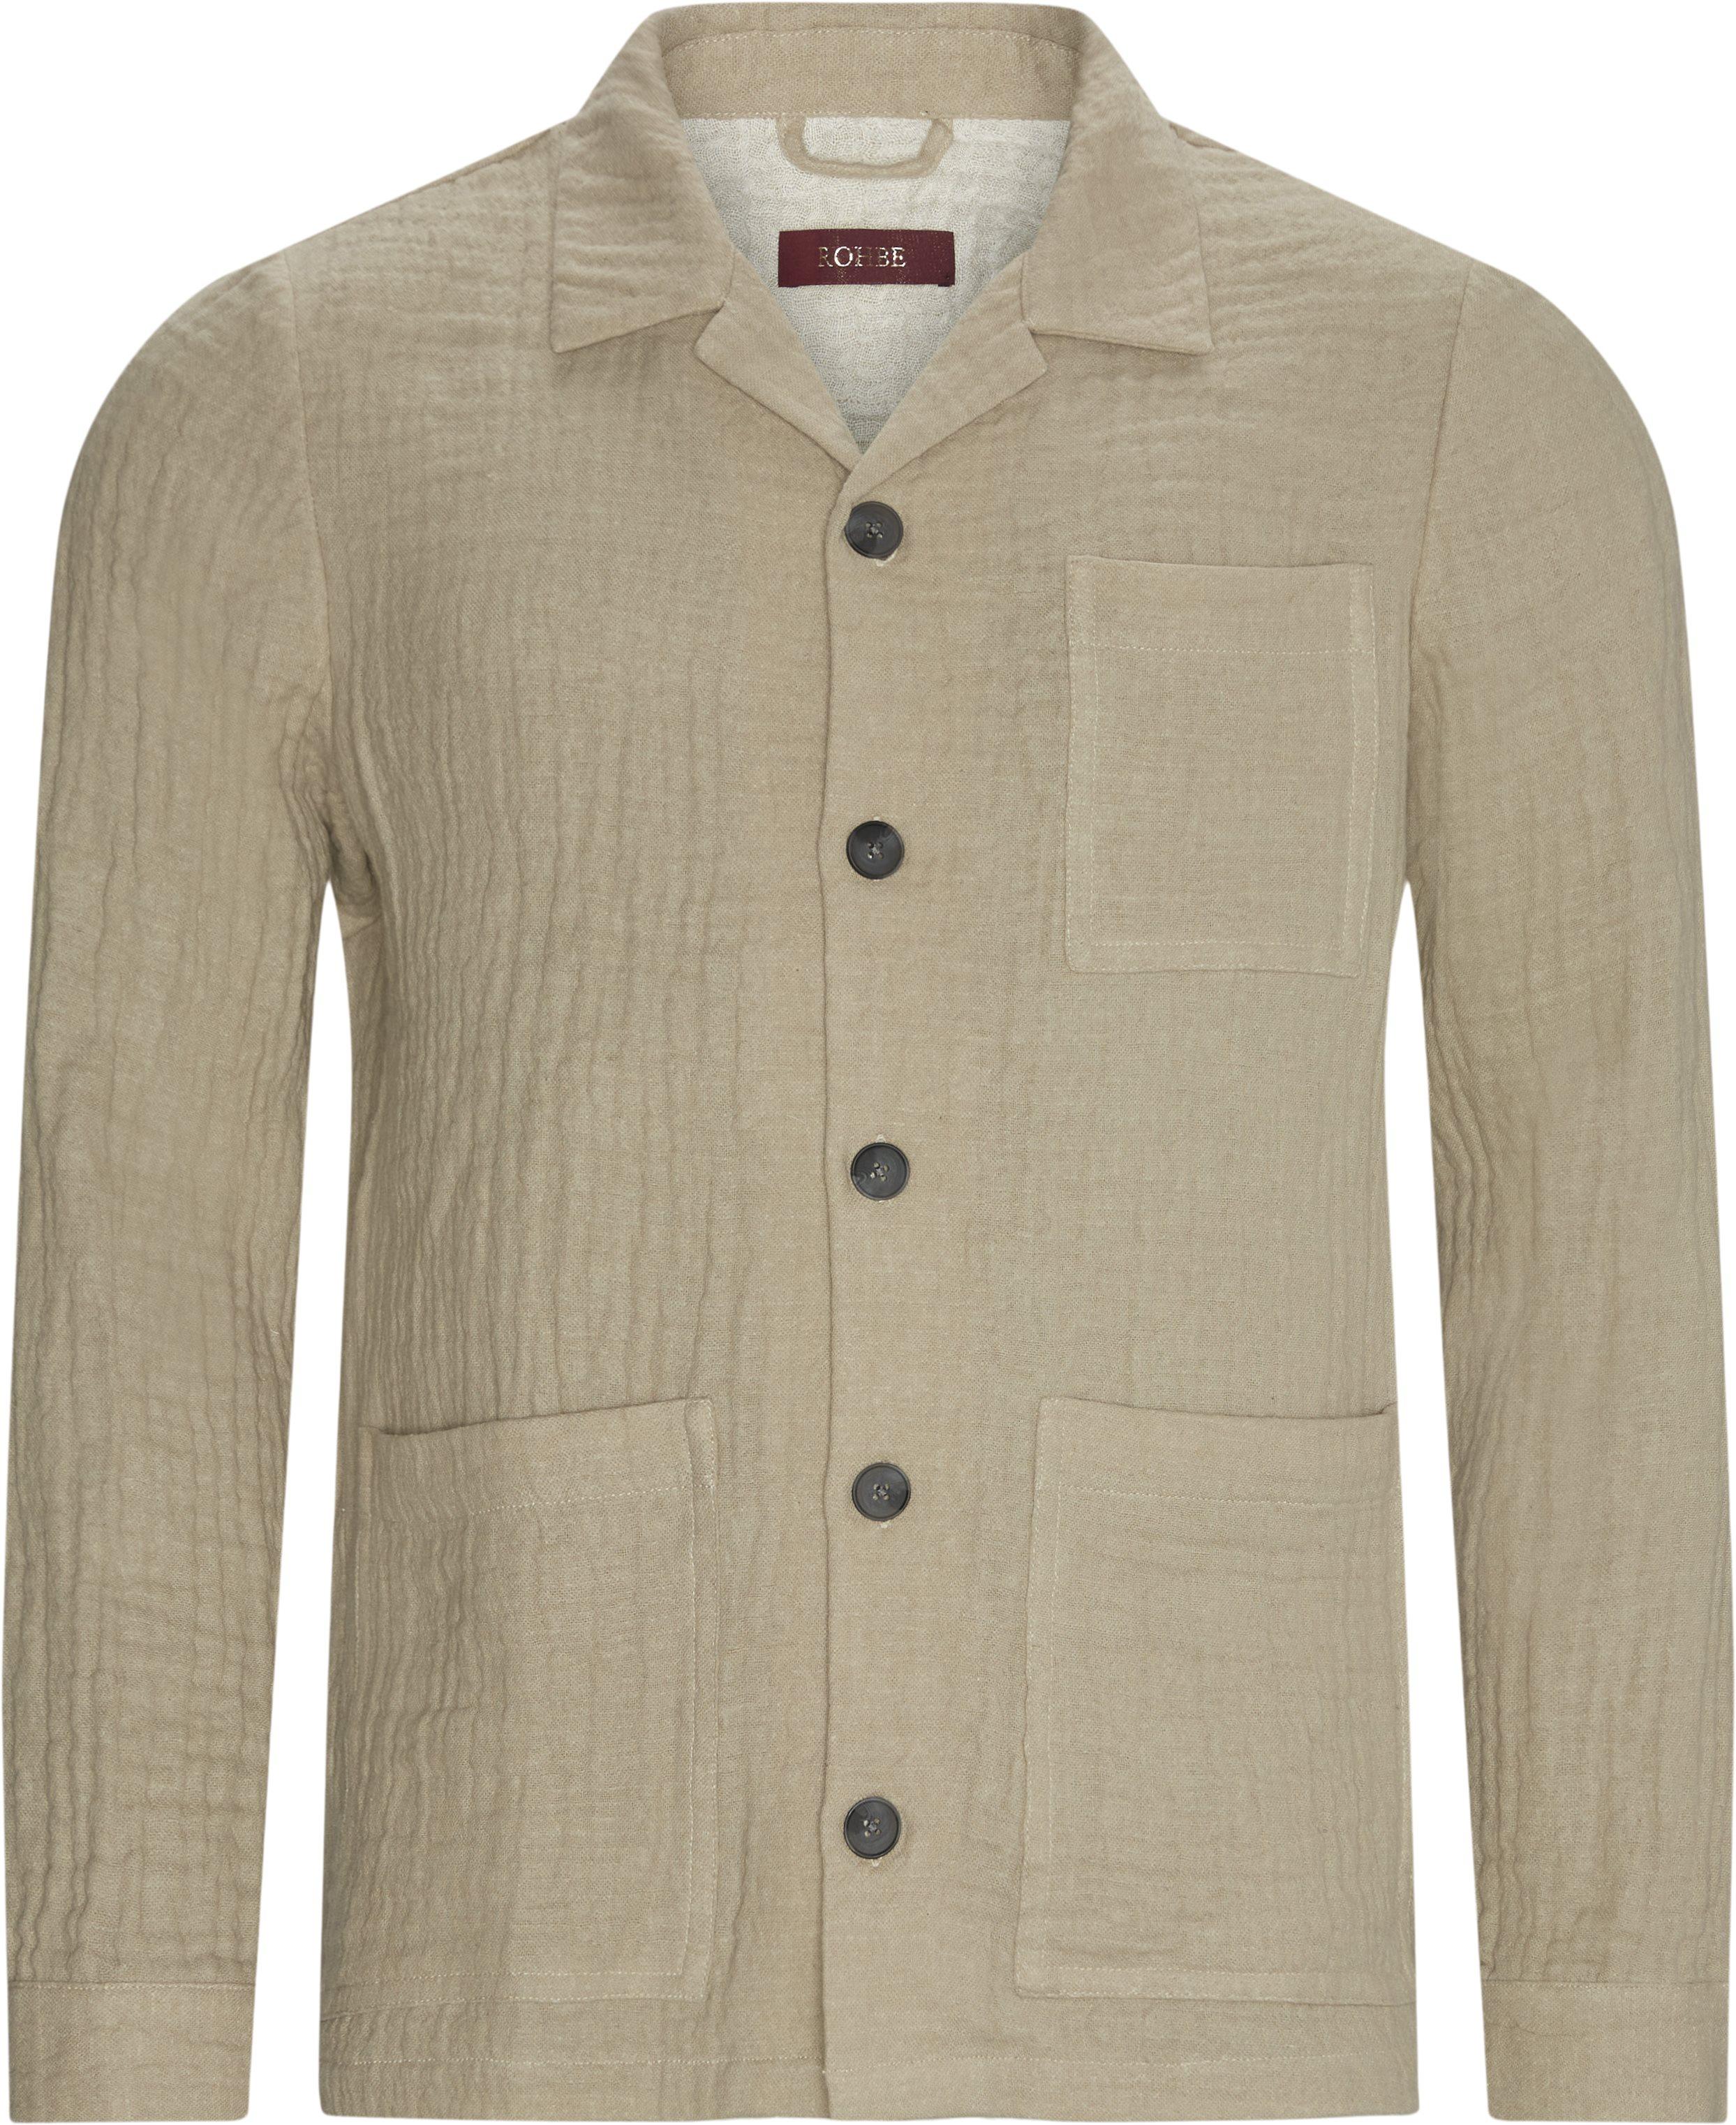 Ben Blazer - Overshirts - Regular fit - Sand